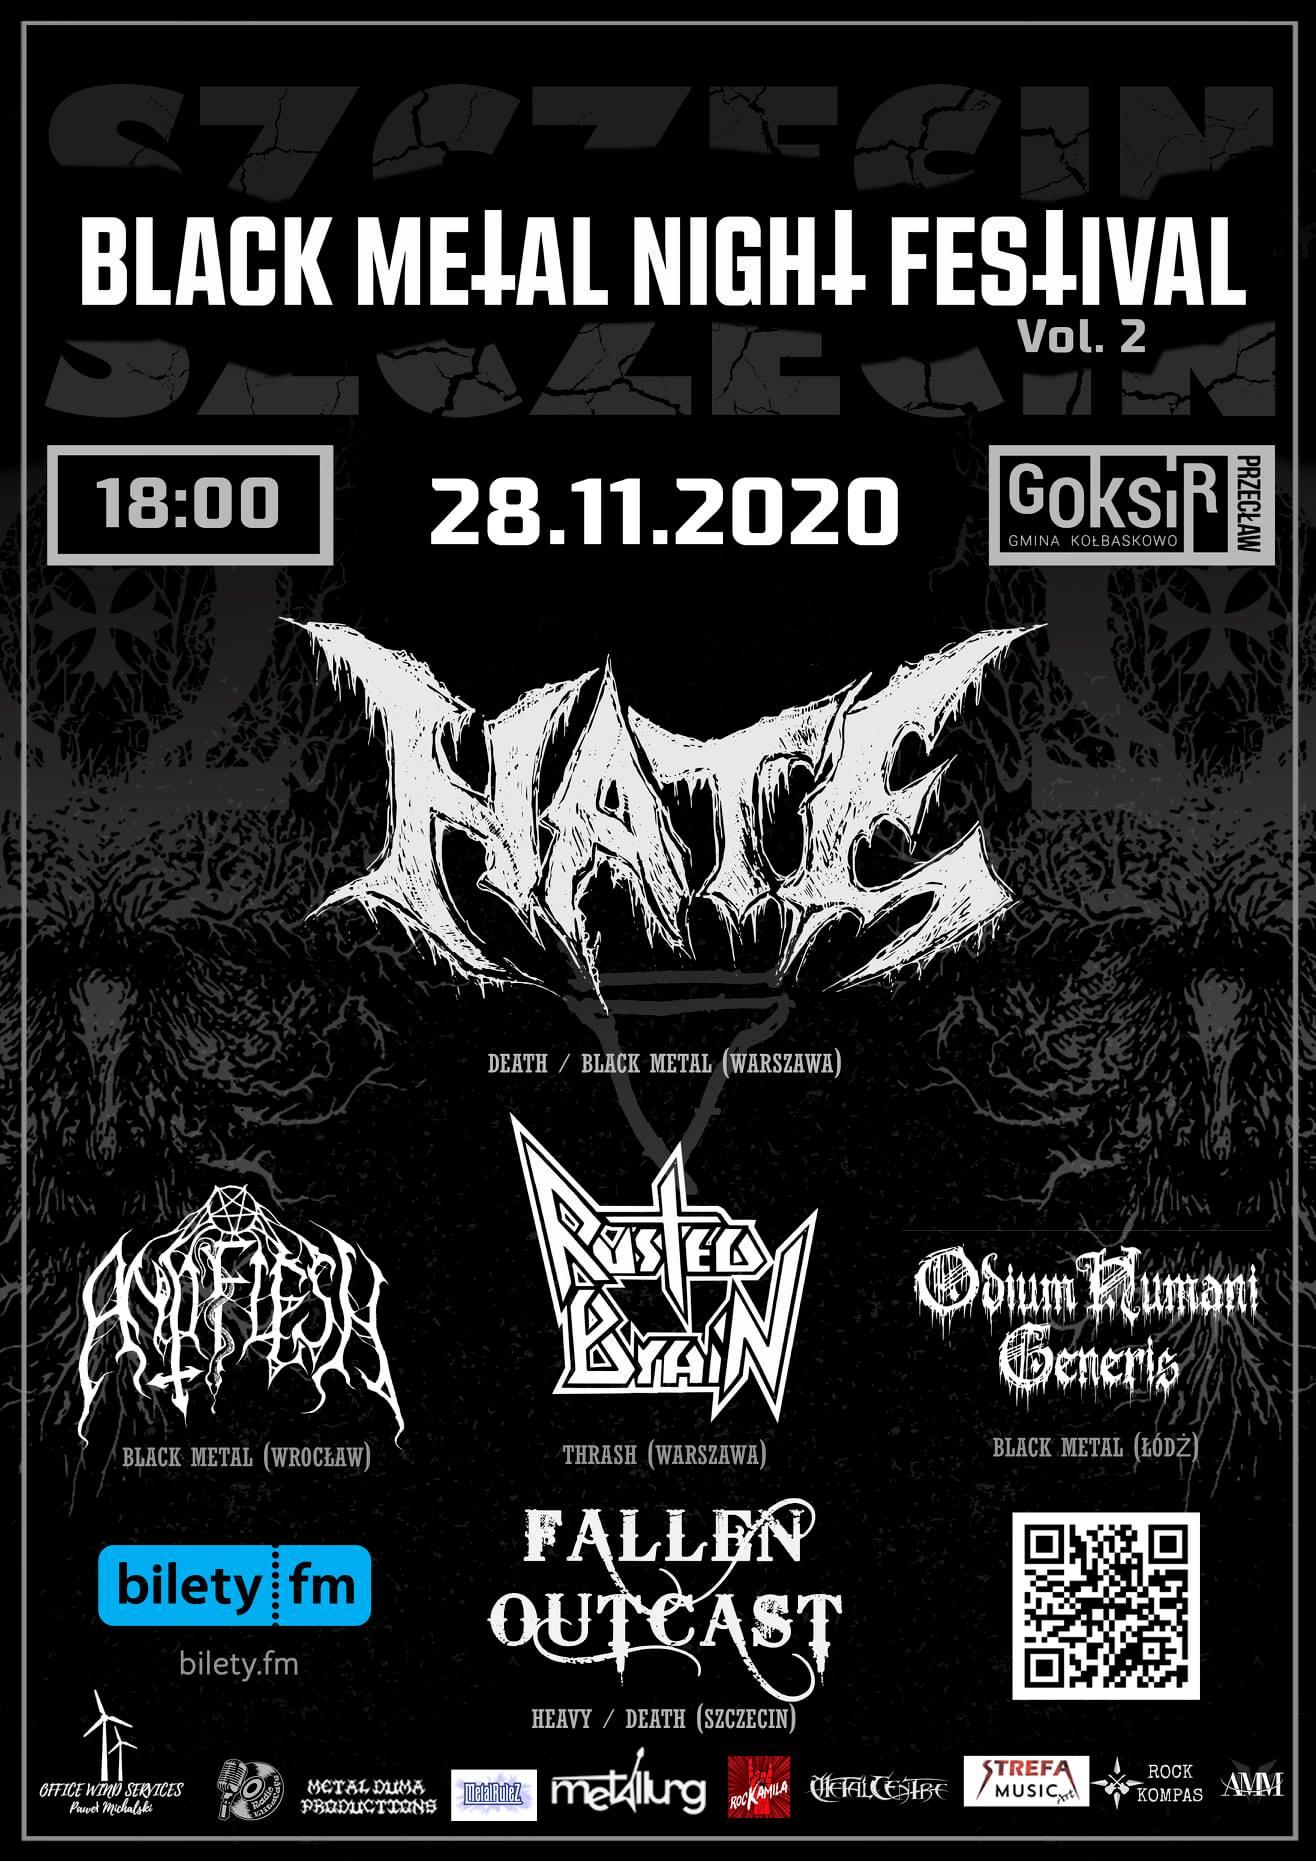 Black Metal Night Festival Szczecin vol.2